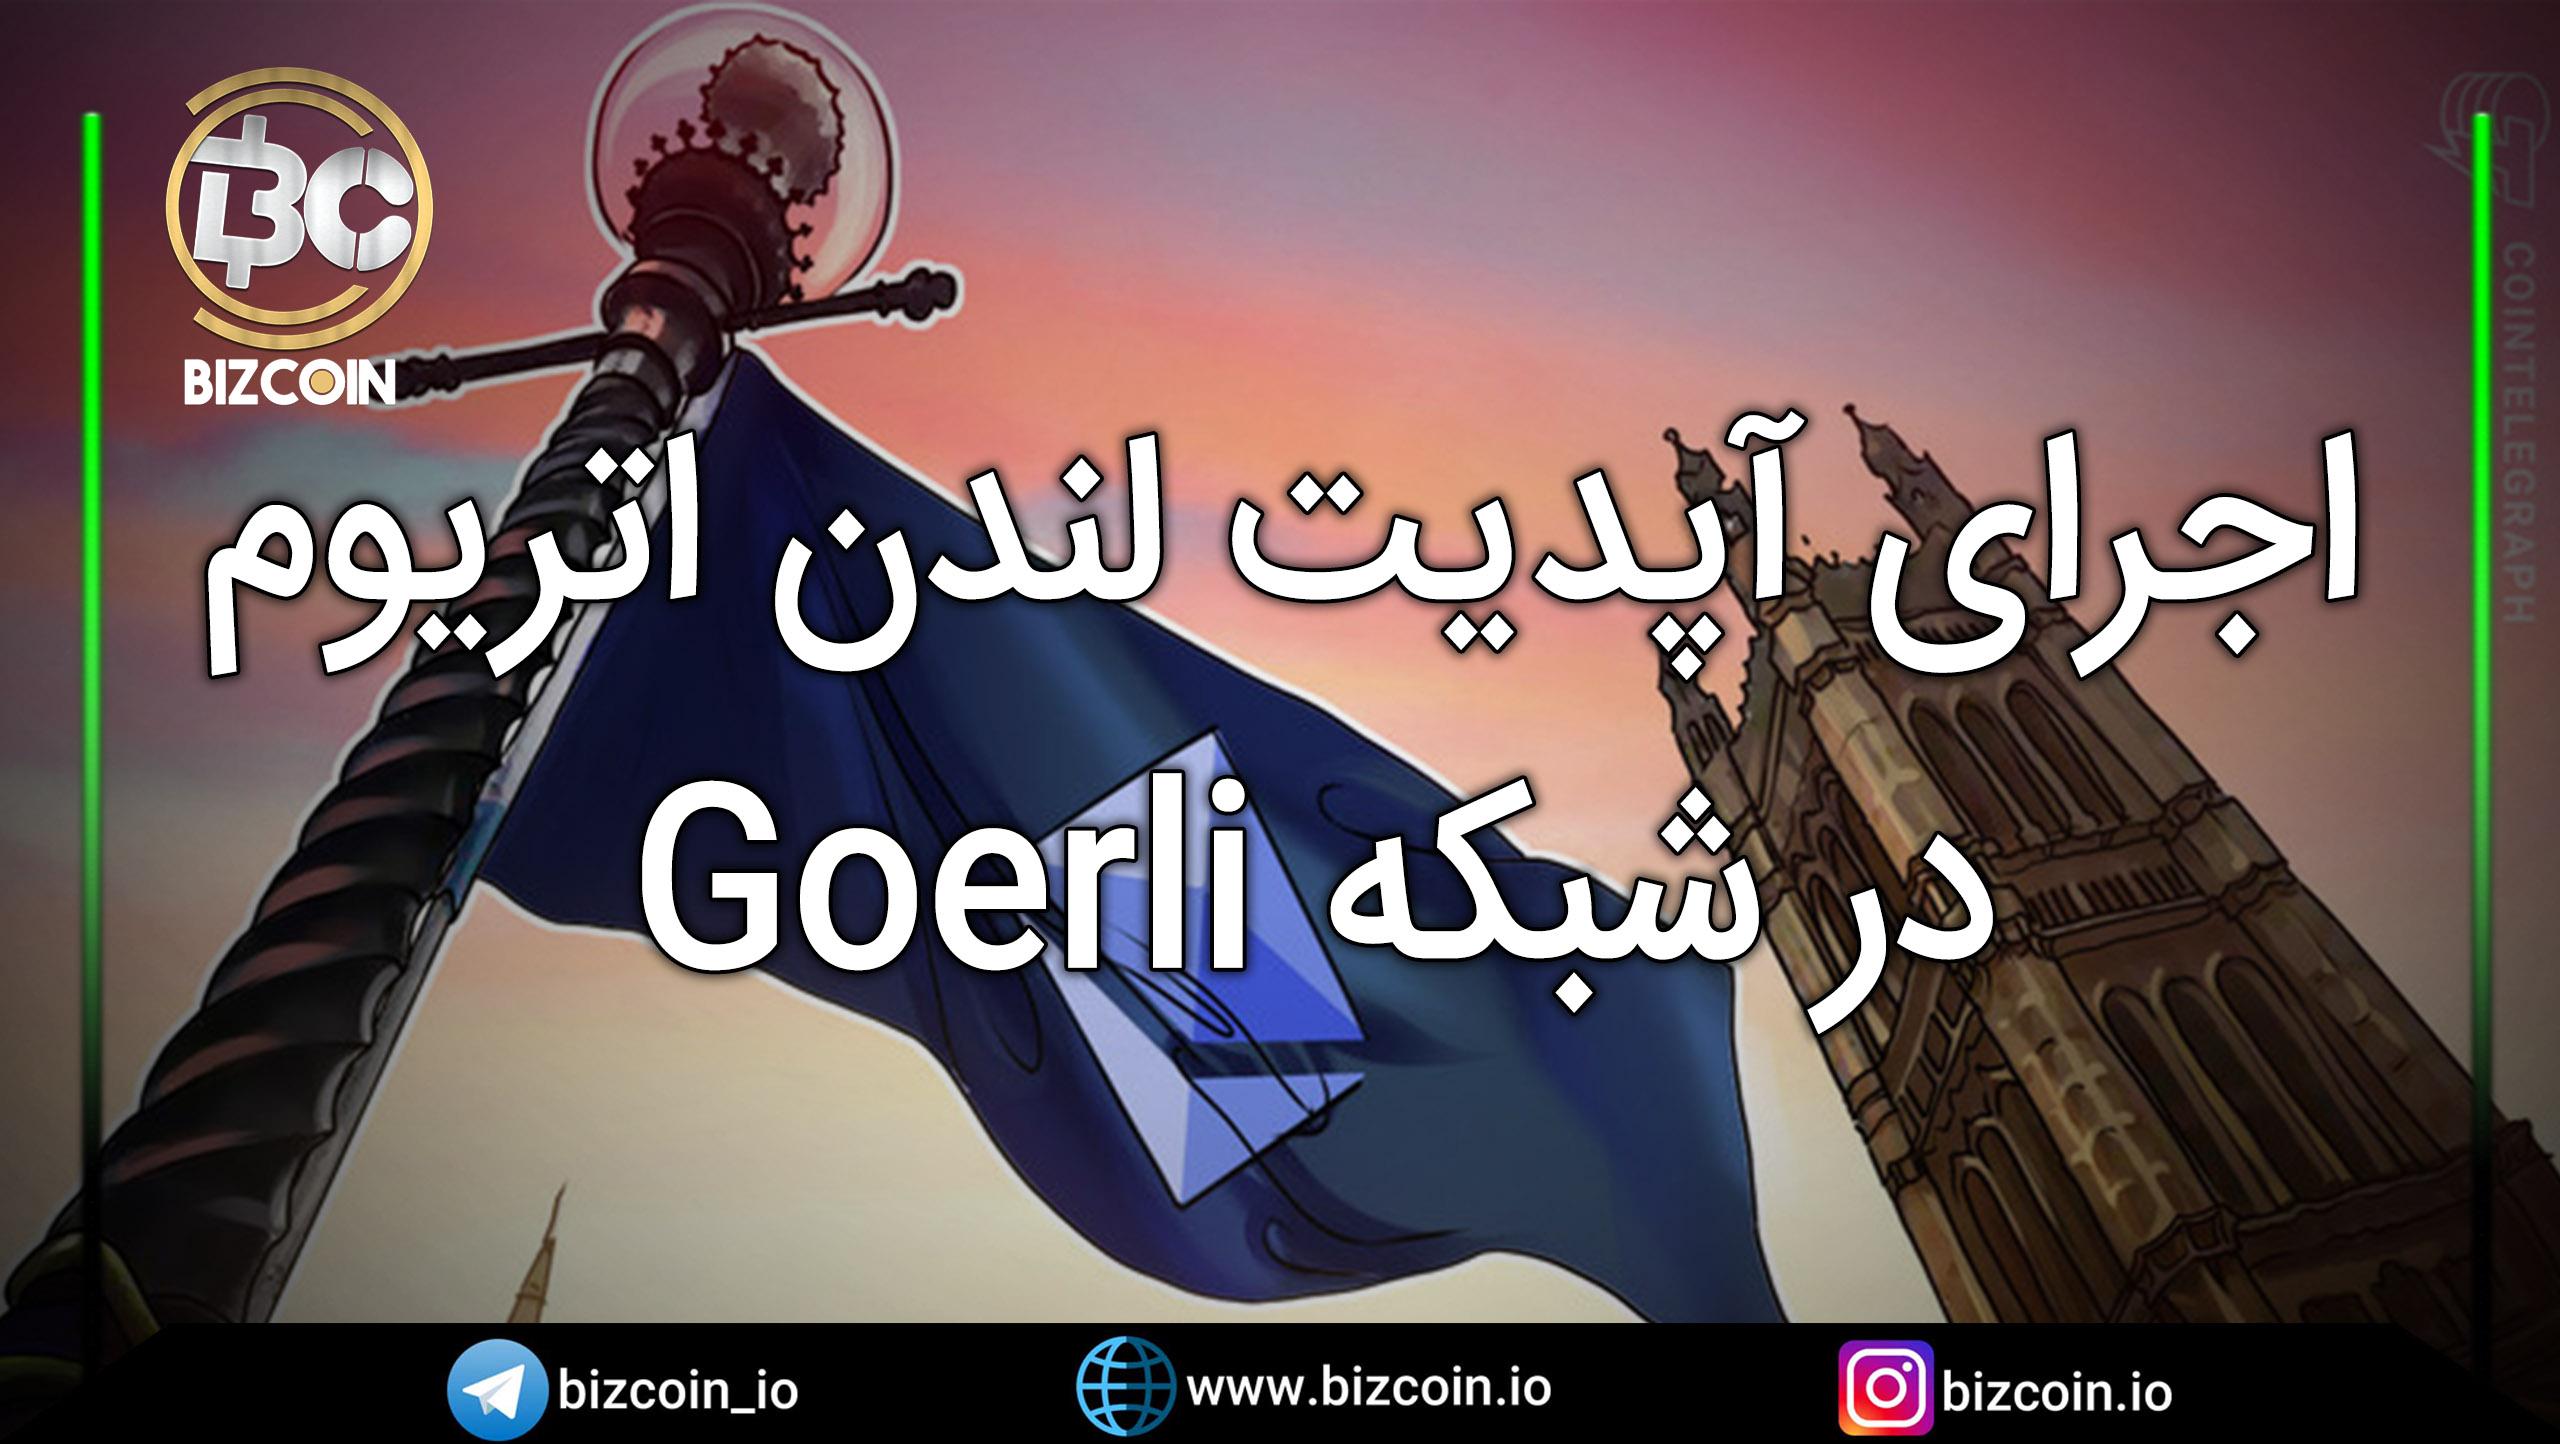 London ethereum update on Goerli network اجرای آپدیت لندن اتریوم در شبکه Goerli